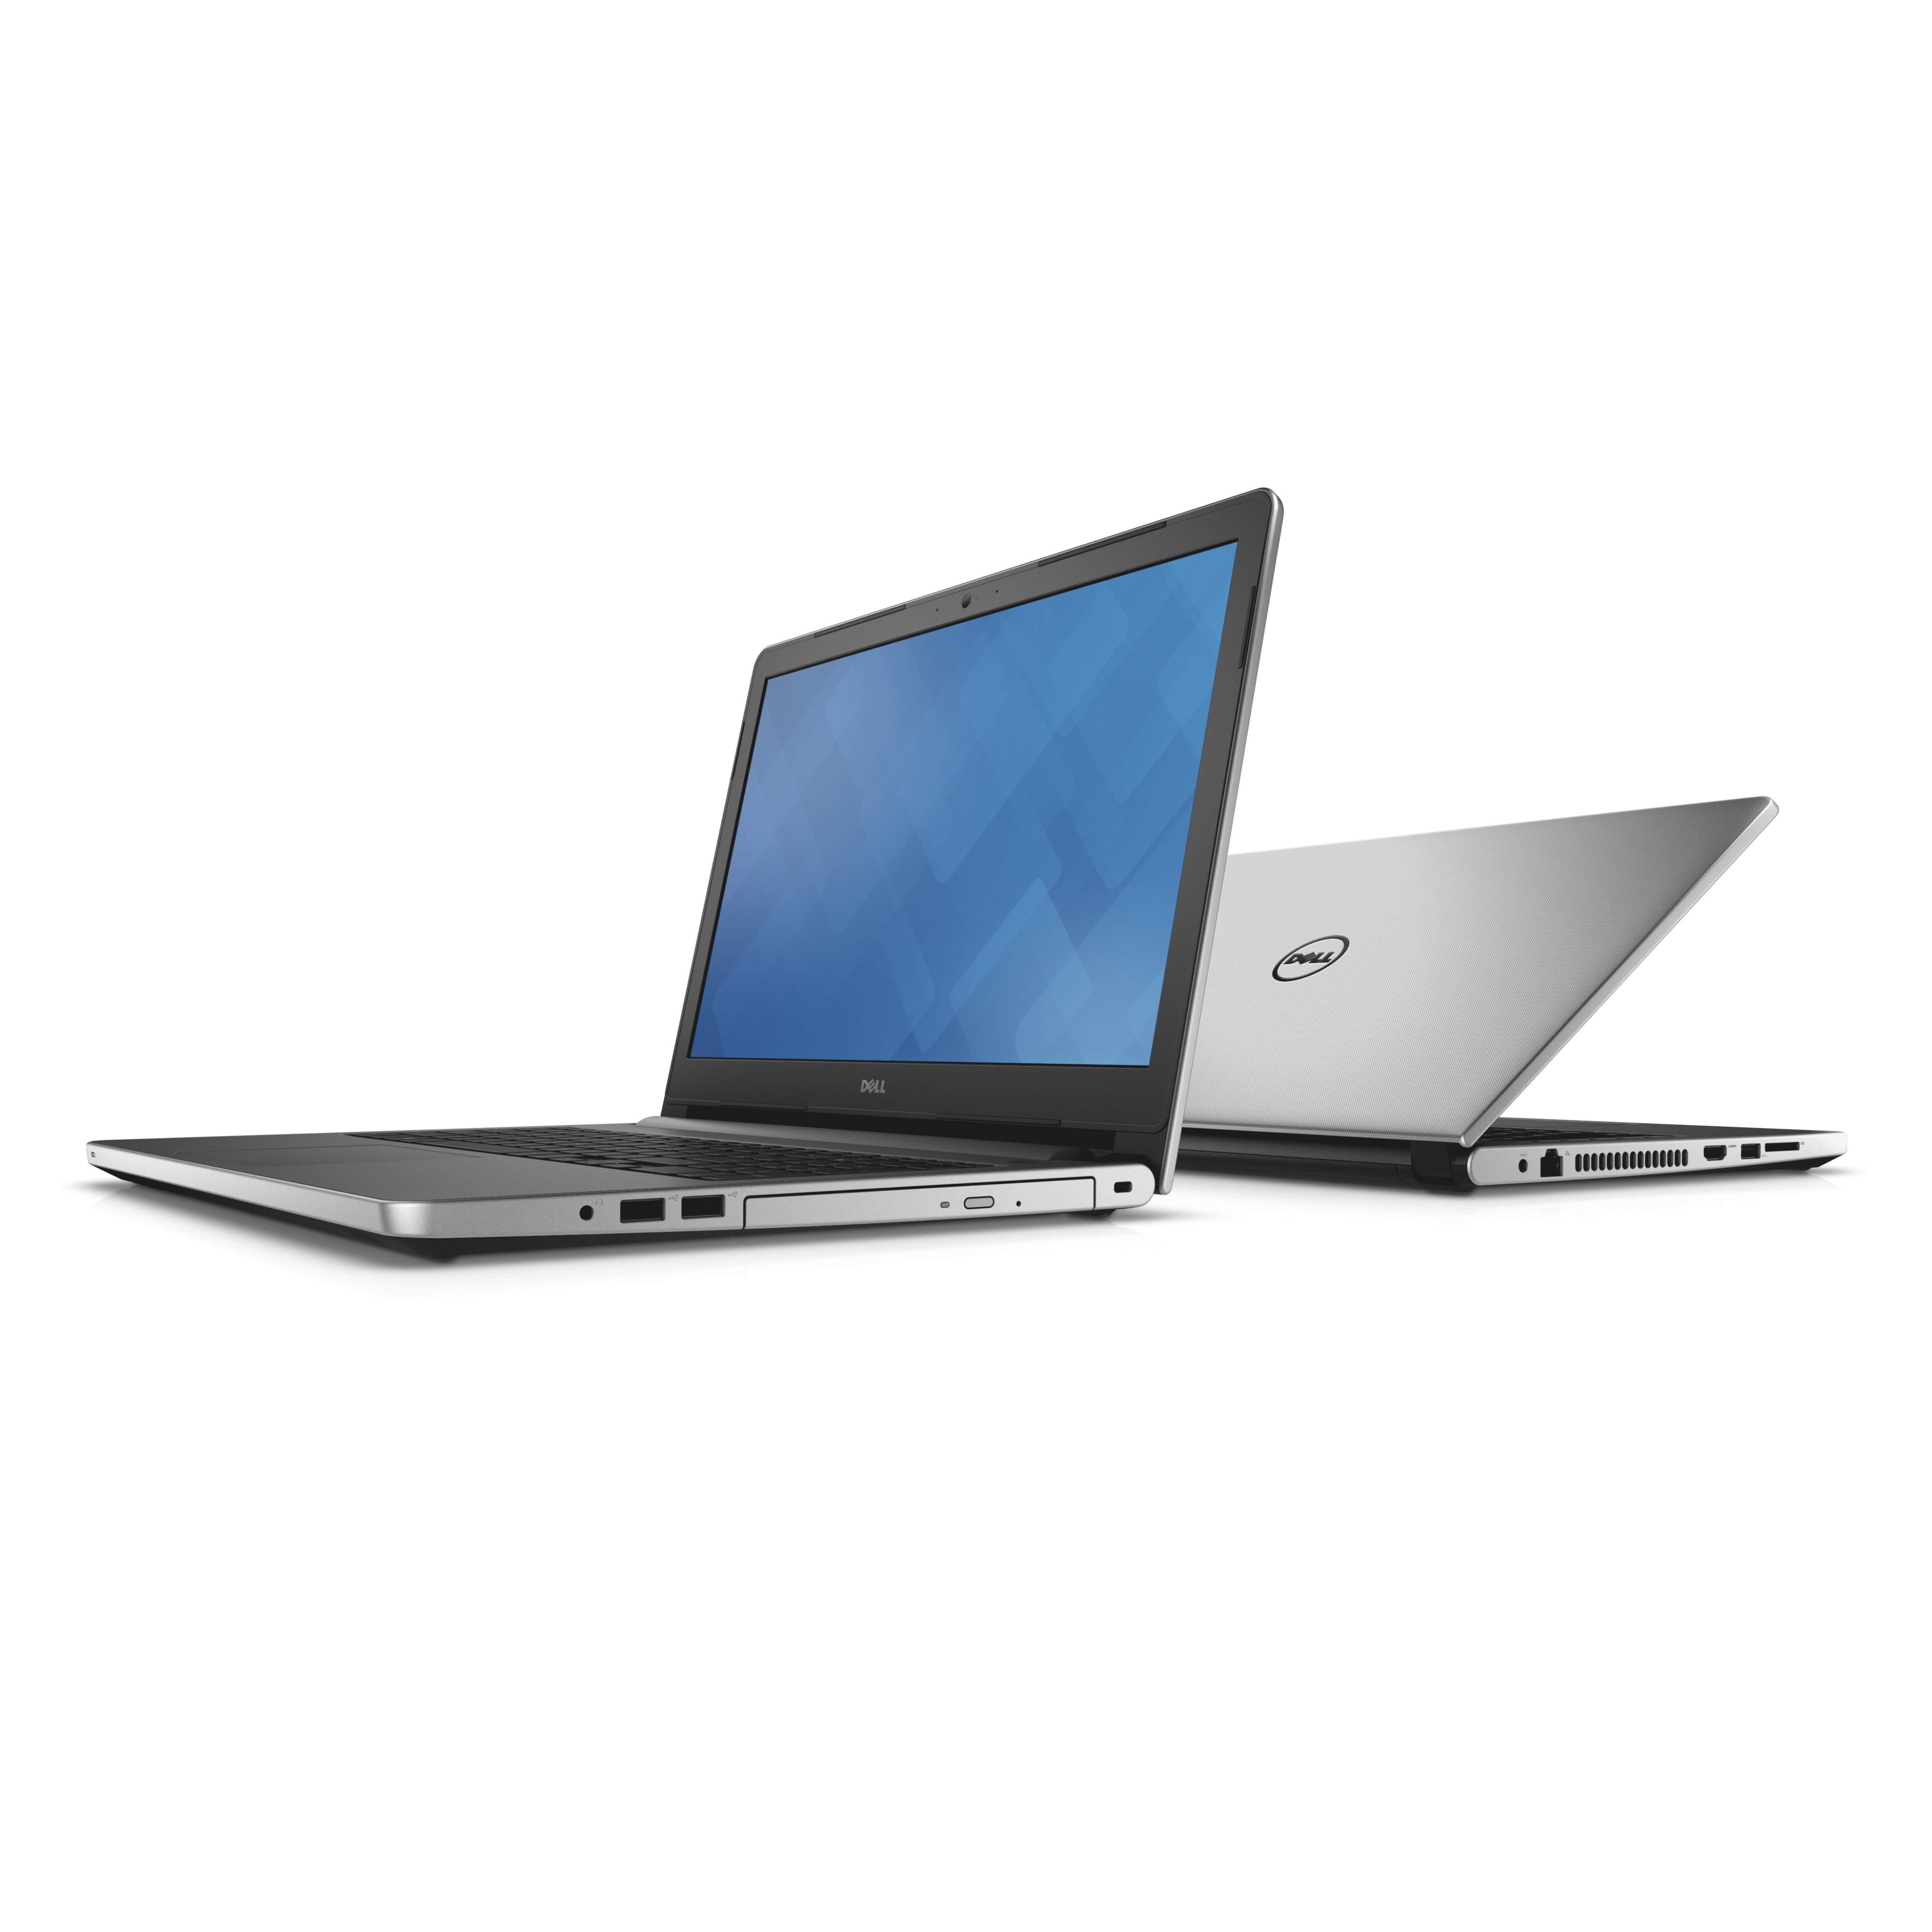 Dell Inspiron 5558 İnceleme